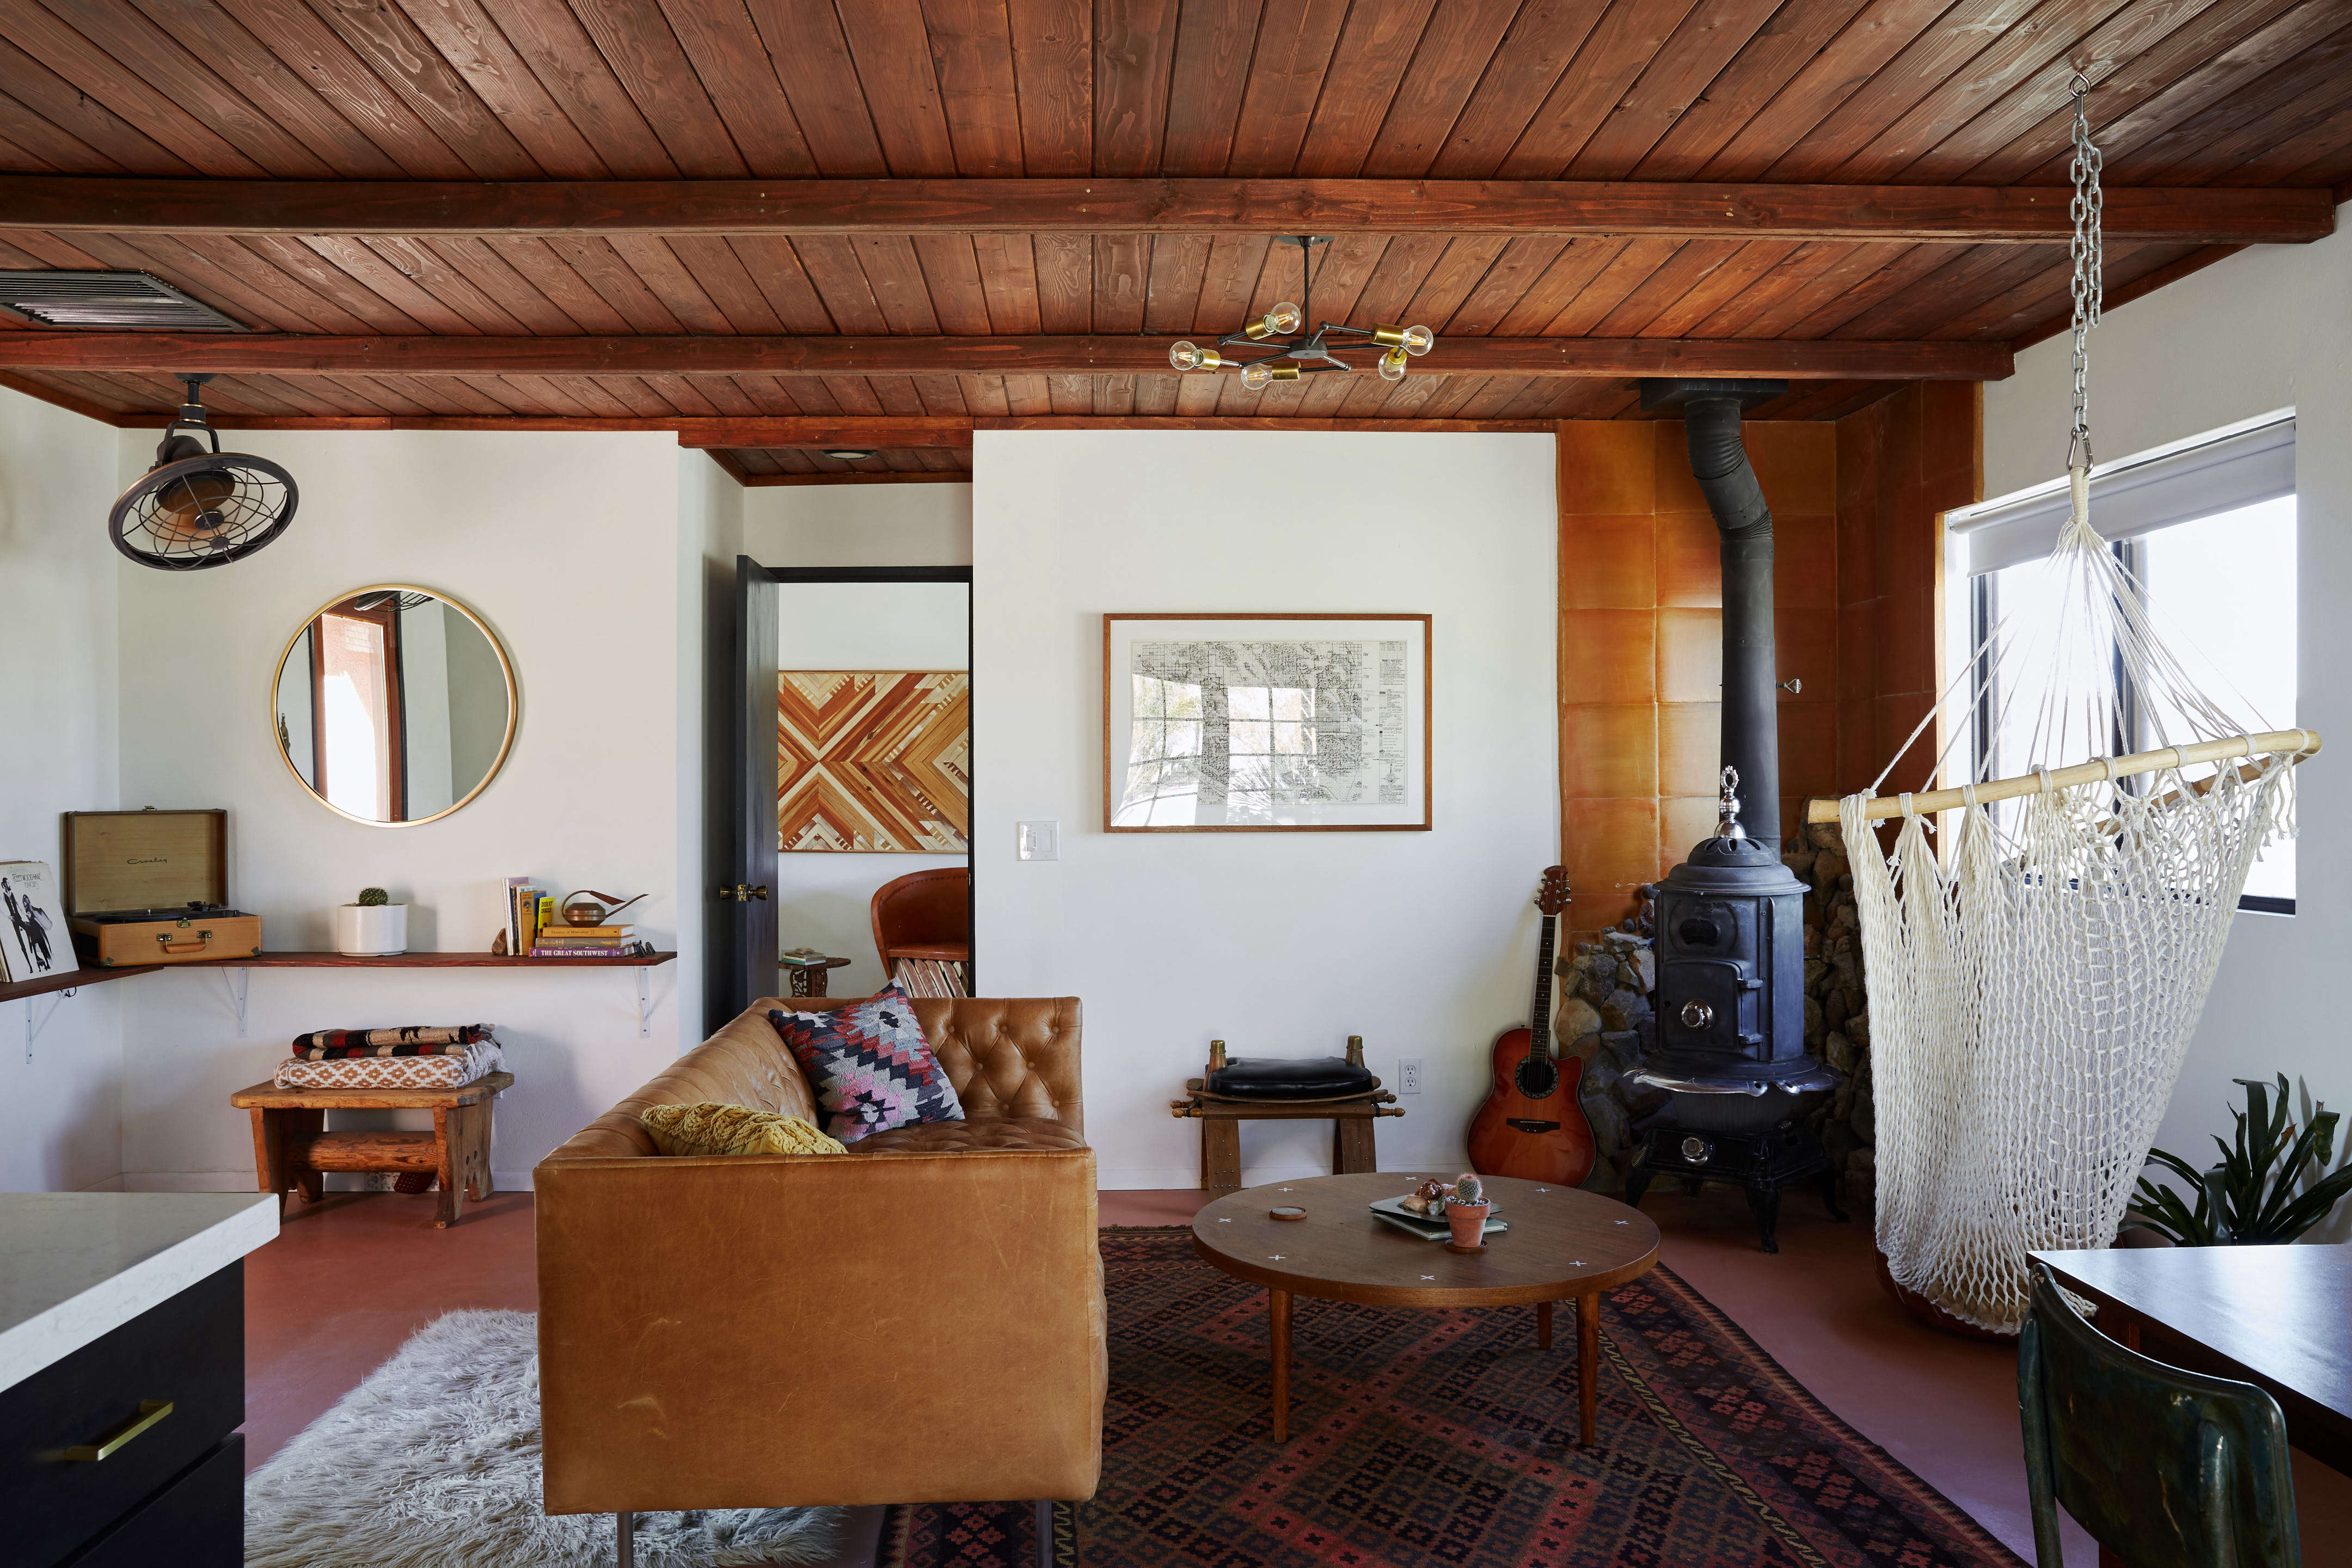 The Joshua Tree Casita: A Stylish DIY Remodel, Budget Edition ...